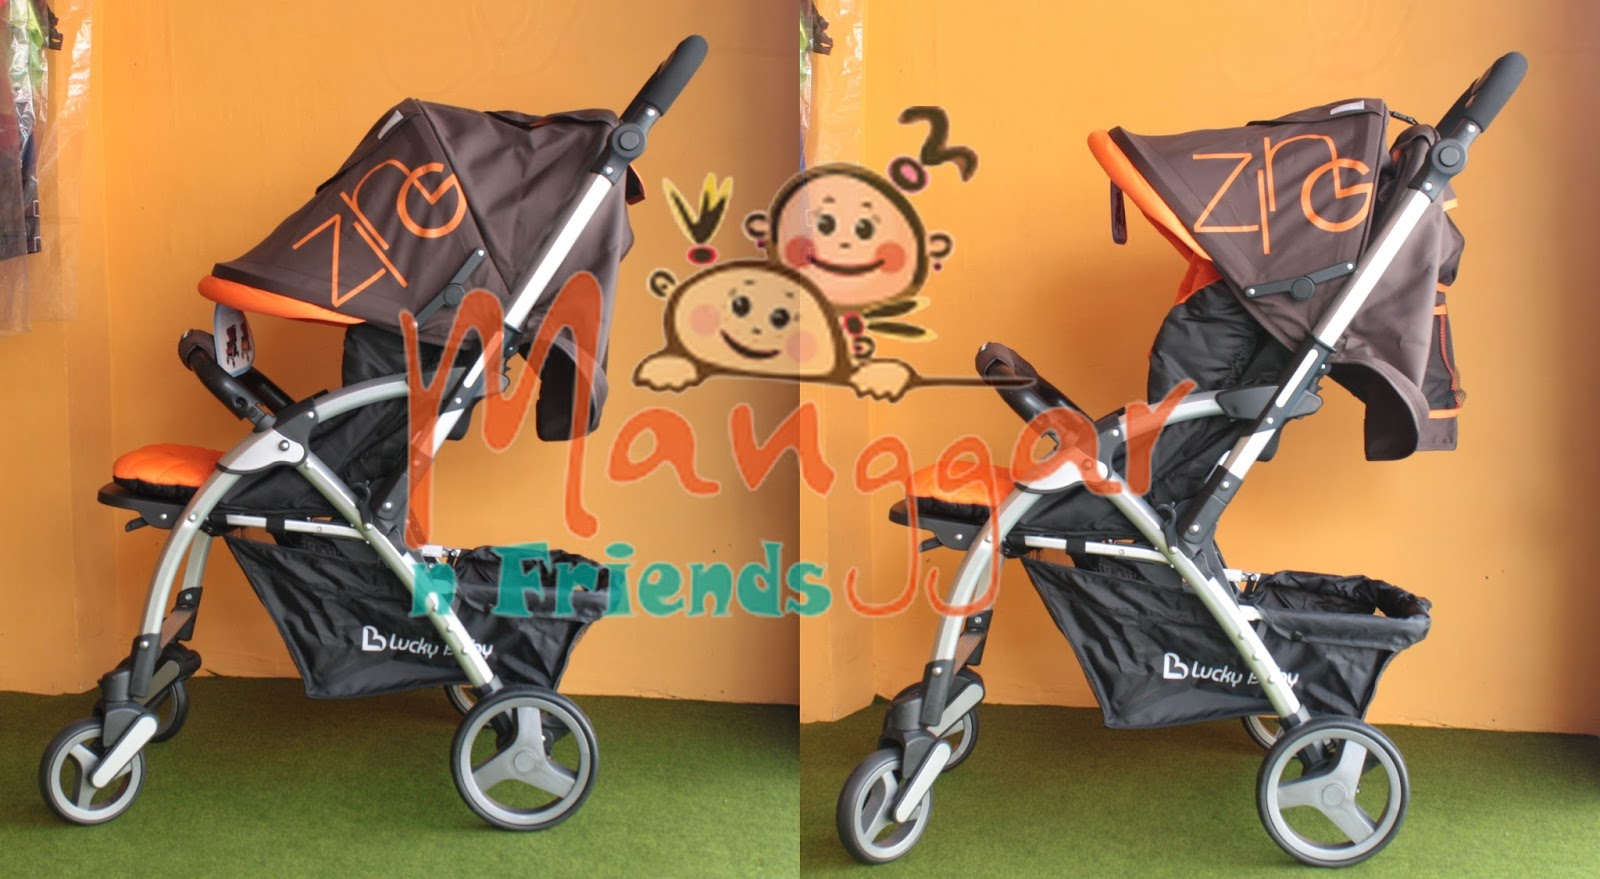 Swing Chair Mudah Sash Ideas Manggar N Friends Baby Rentals St 05 Lucky Zing